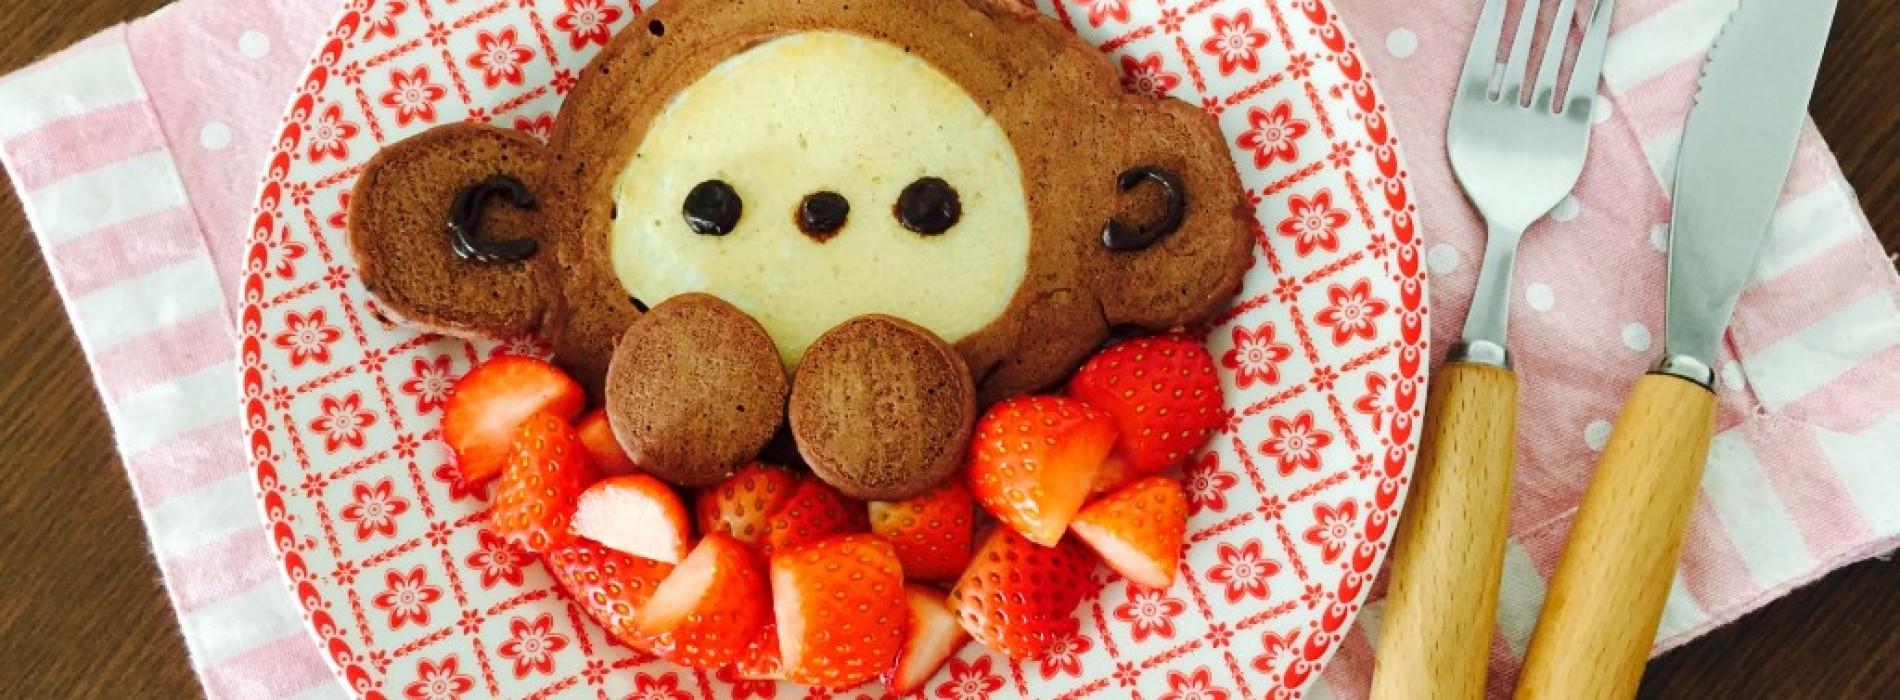 Happy Cook: 賀猴年‧馬騮仔班戟